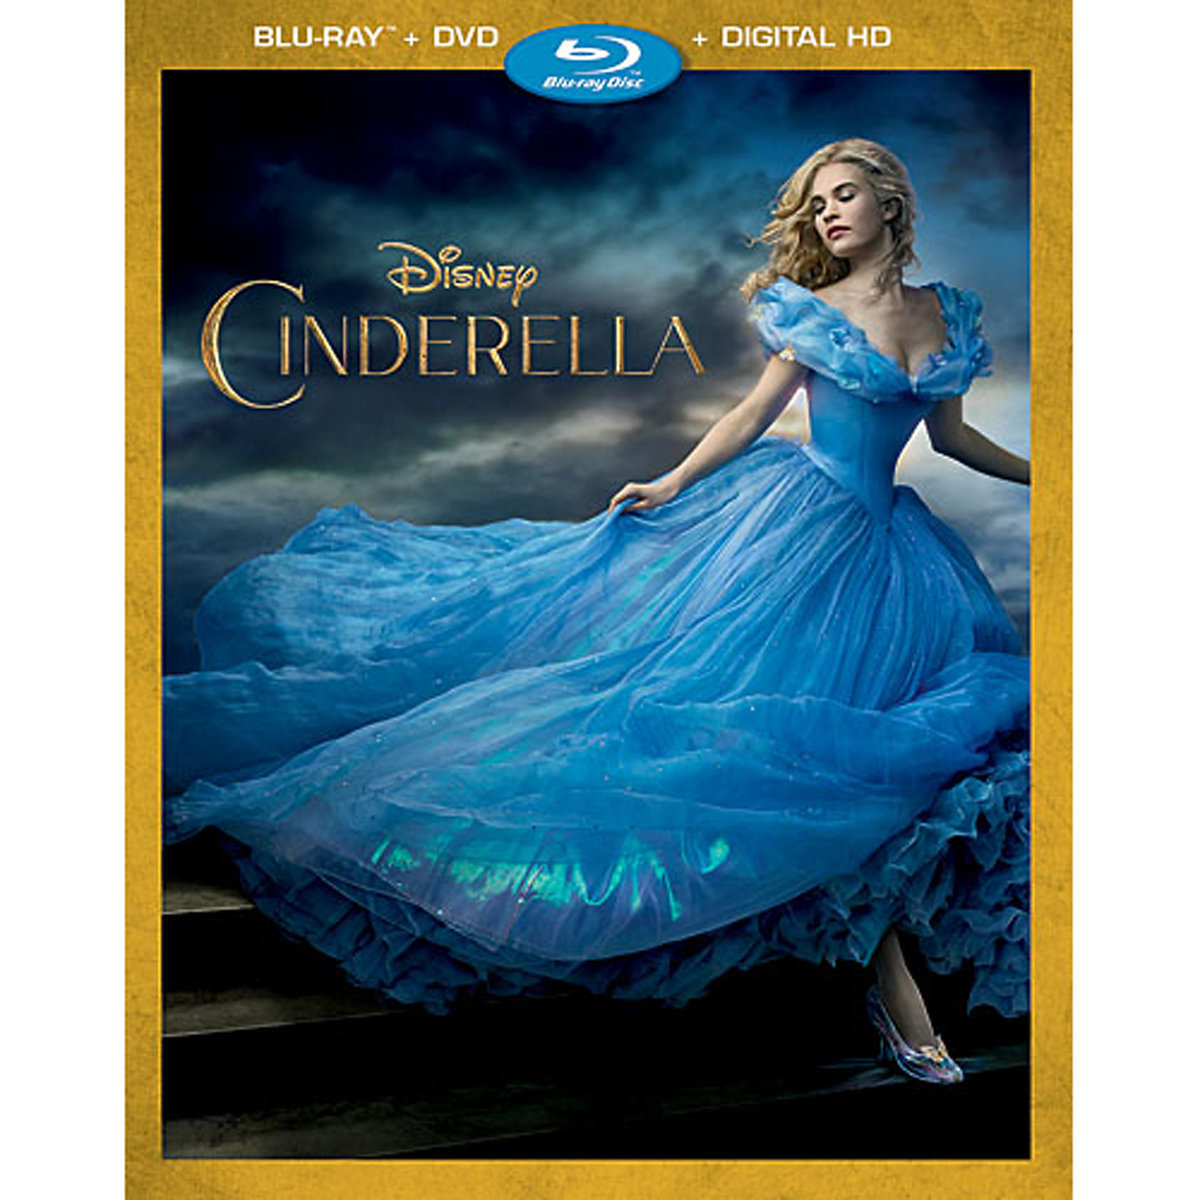 Click here to buy Cinderella (2015) (Blu-ray + DVD + Digital HD) by BUENA VISTA HOME ENTERTAIMENT.